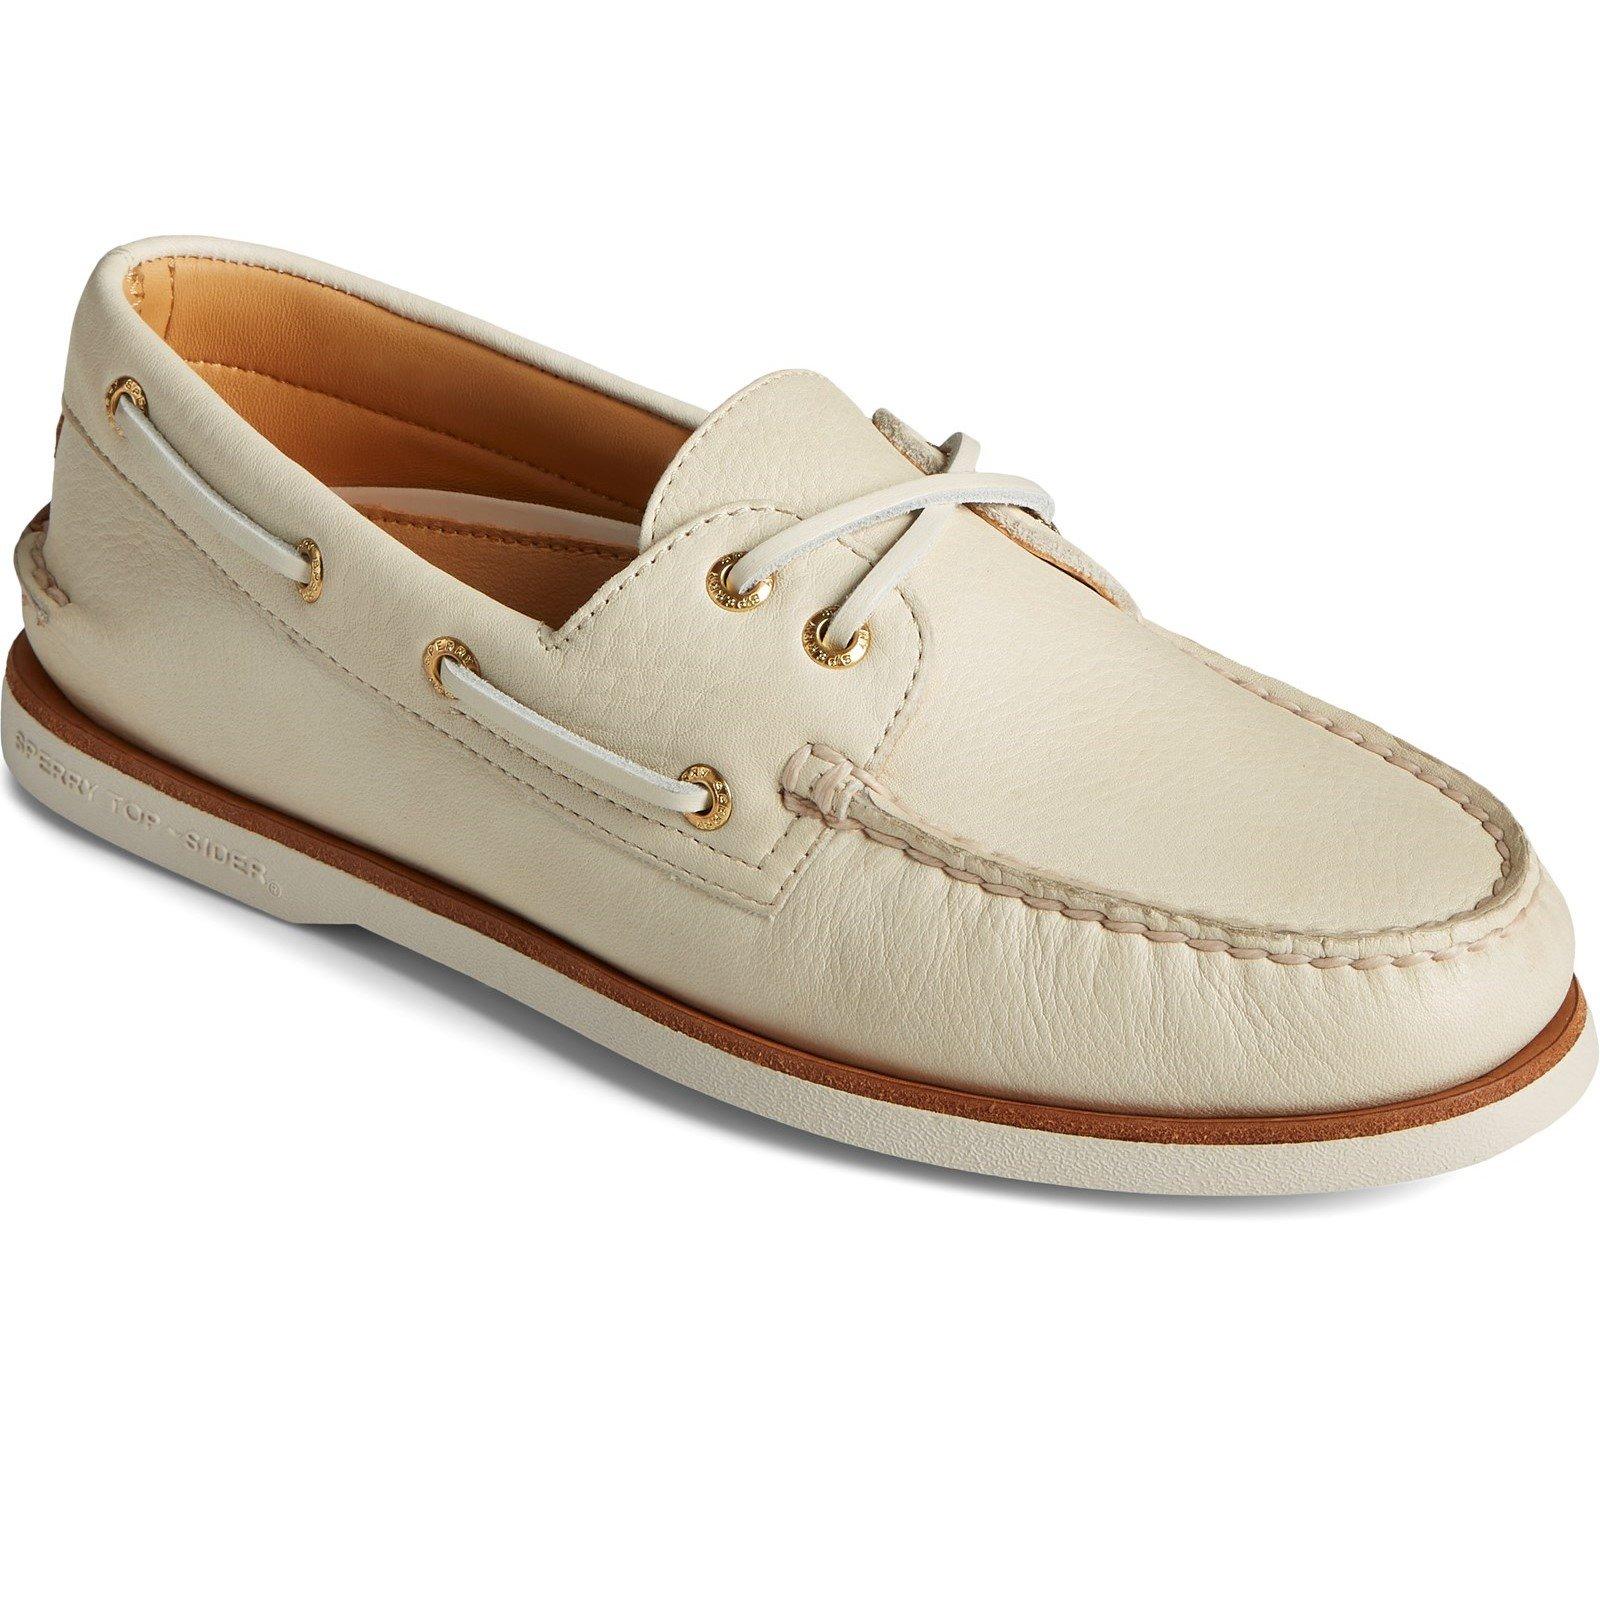 Sperry Men's A/O 2-Eye Boat Shoe Various Colours 32926 - Cream 12